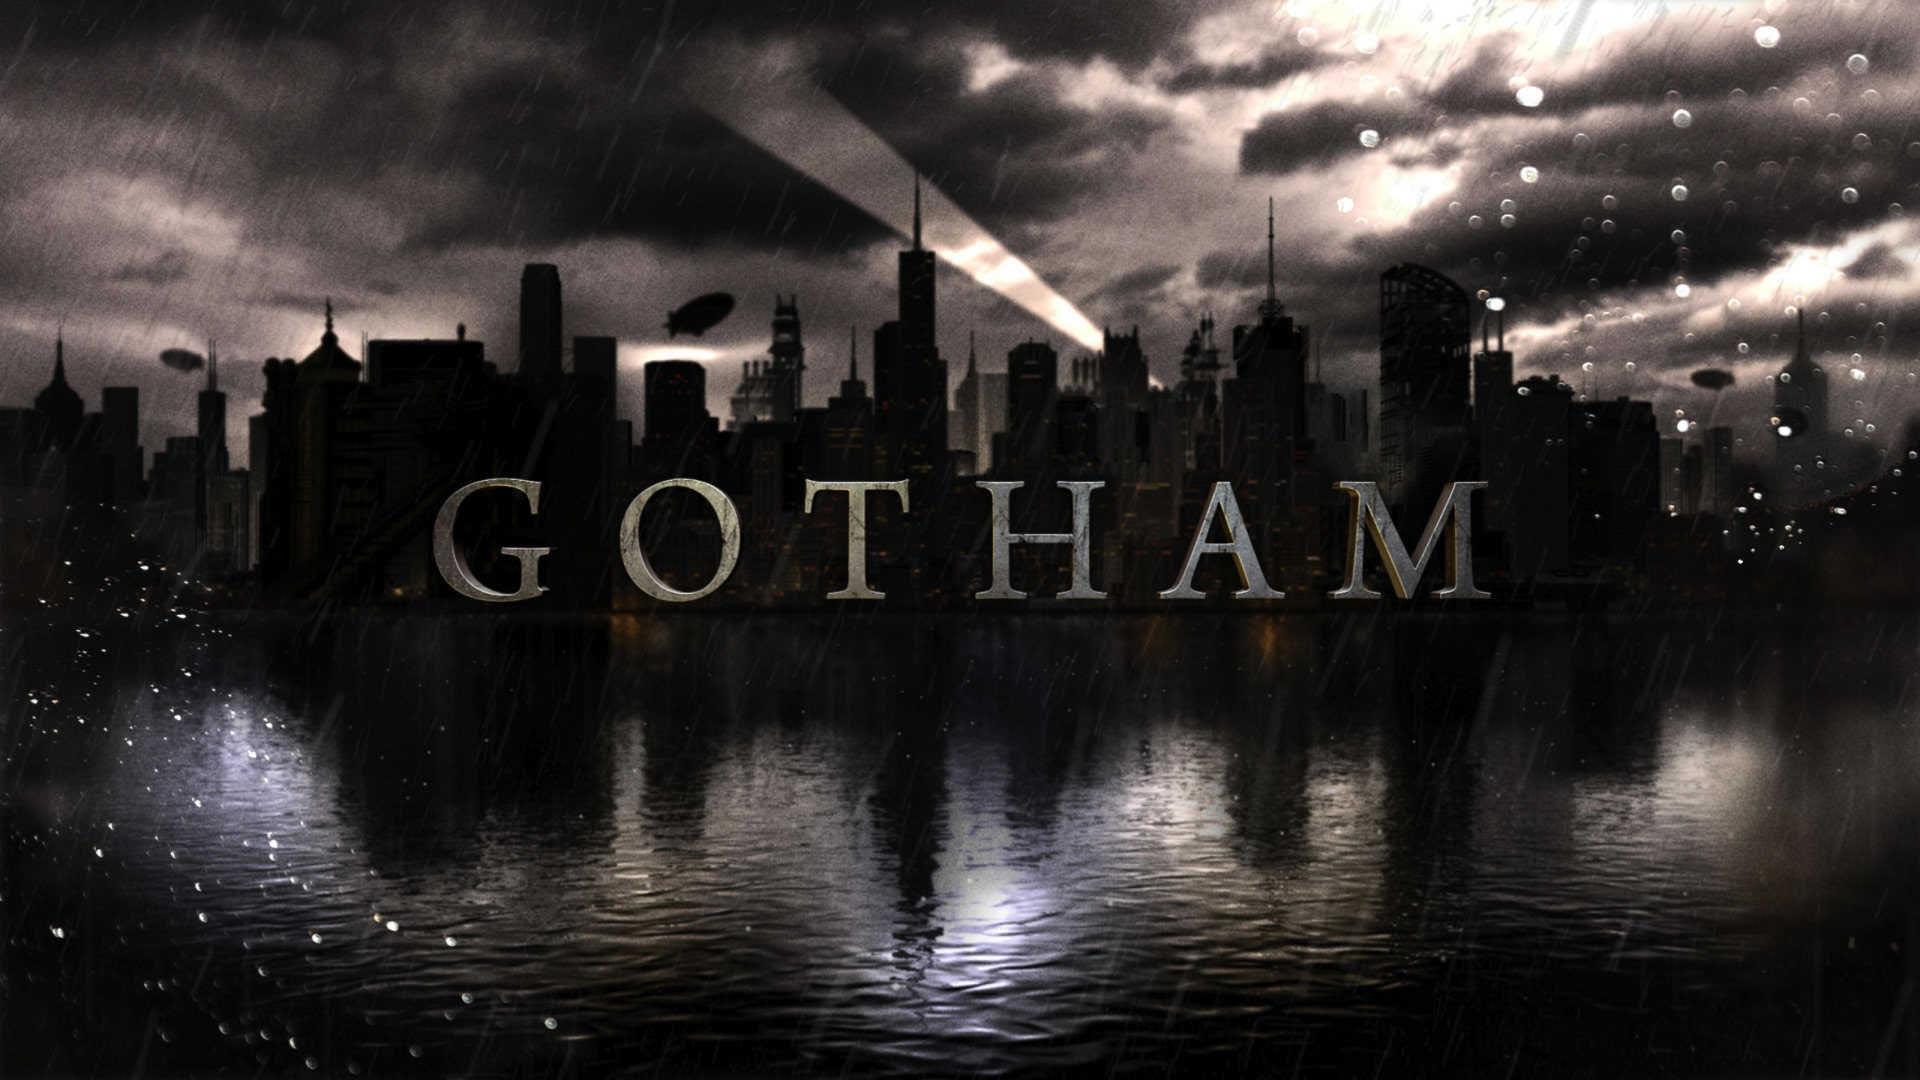 Gotham City By Night